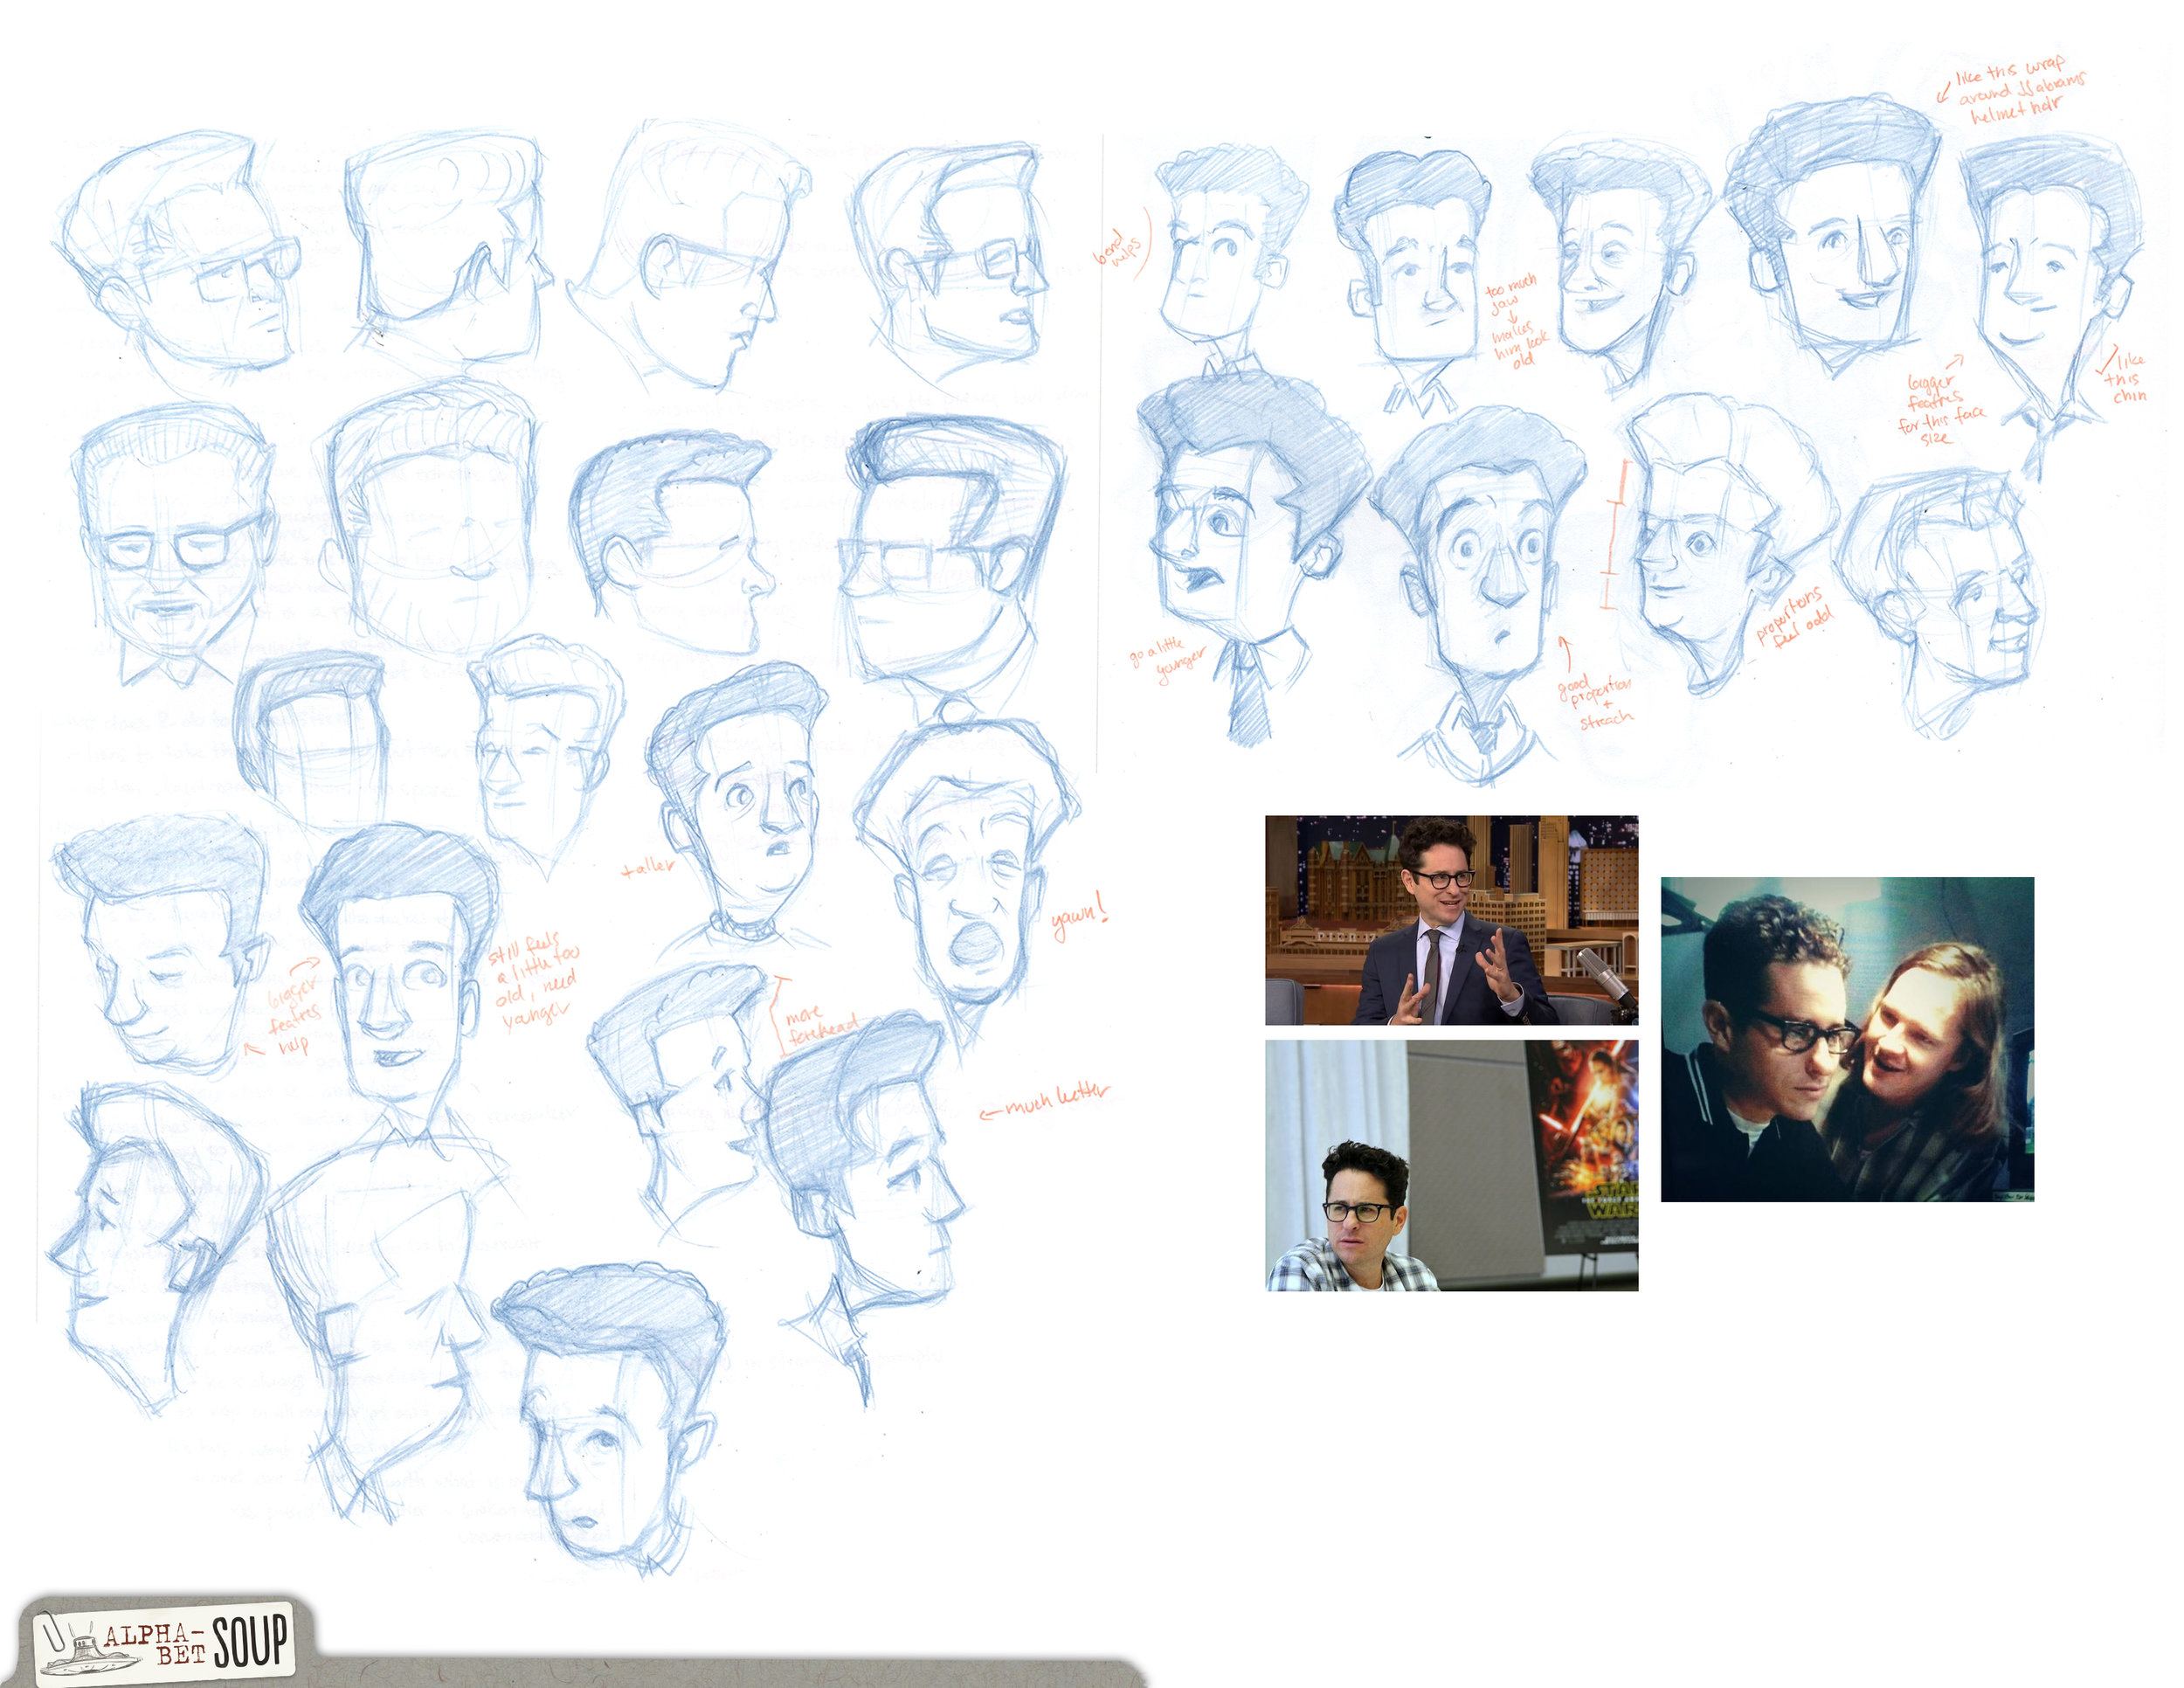 richard sketch 3.jpg